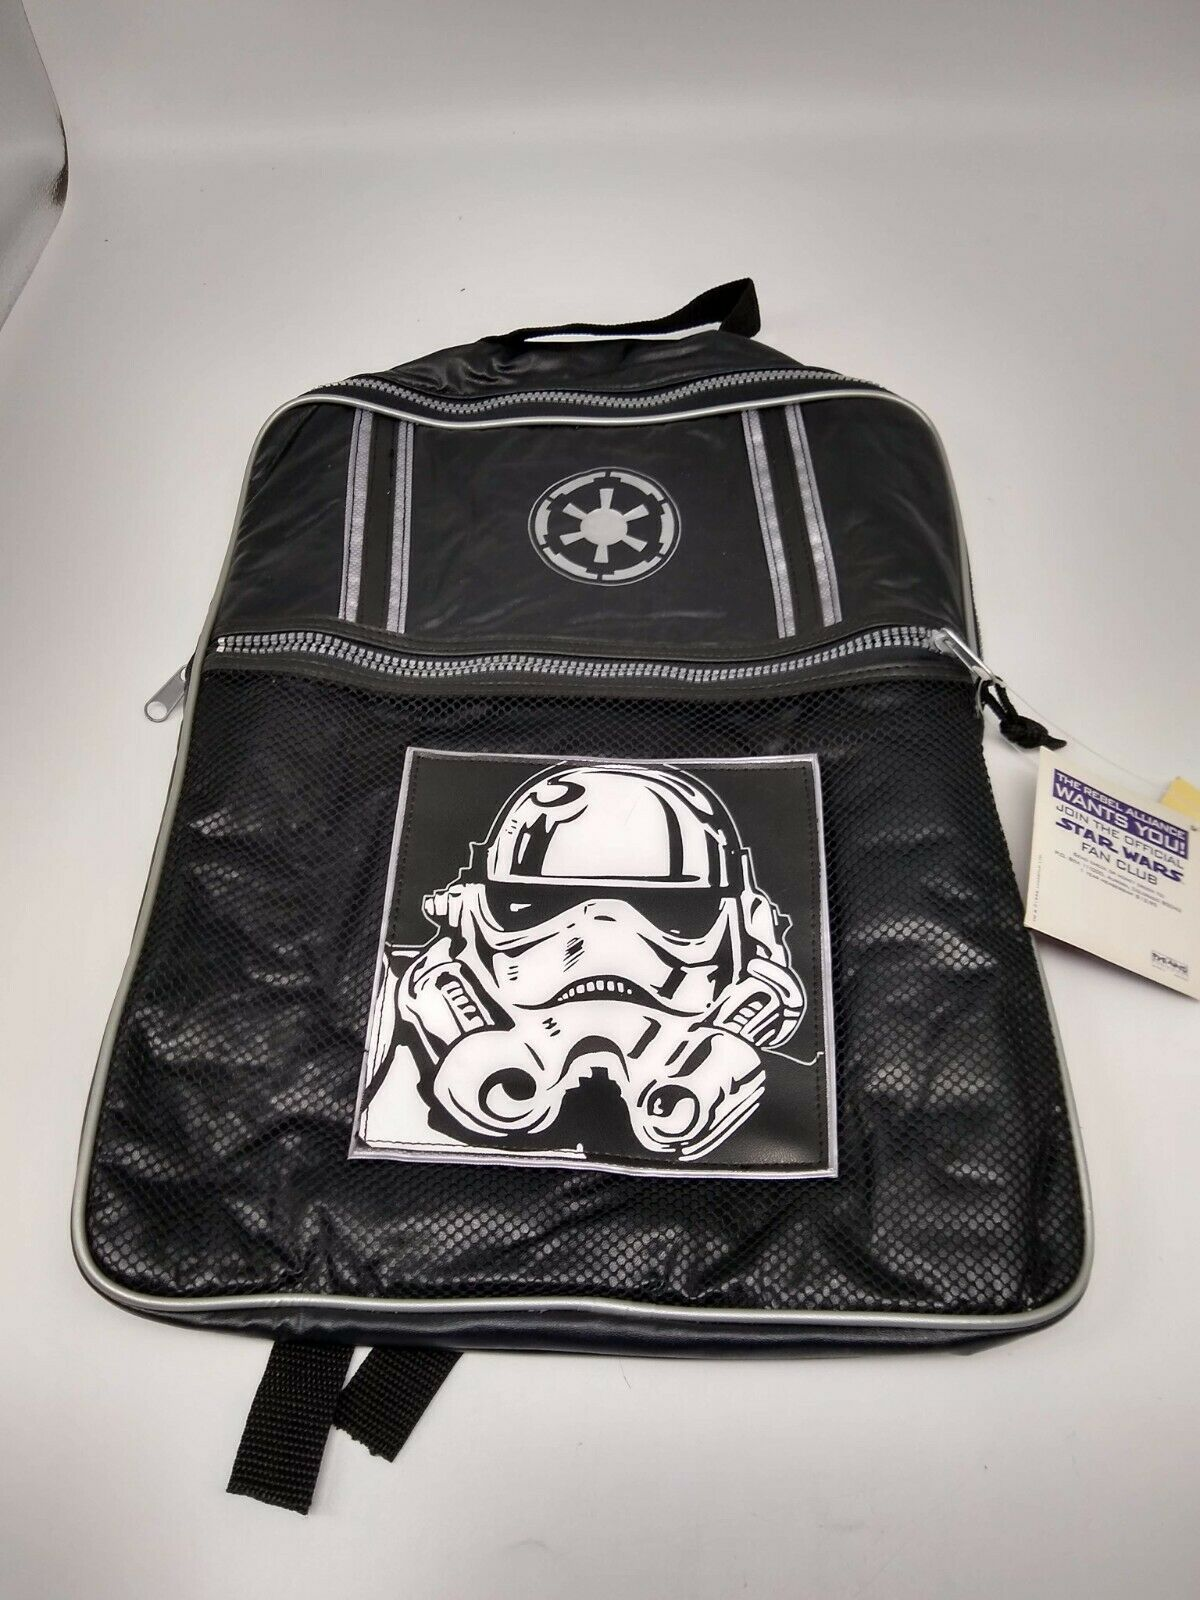 Star Wars 1996 Stormtrooper Kids Vinyl Backpack - Never Been Used